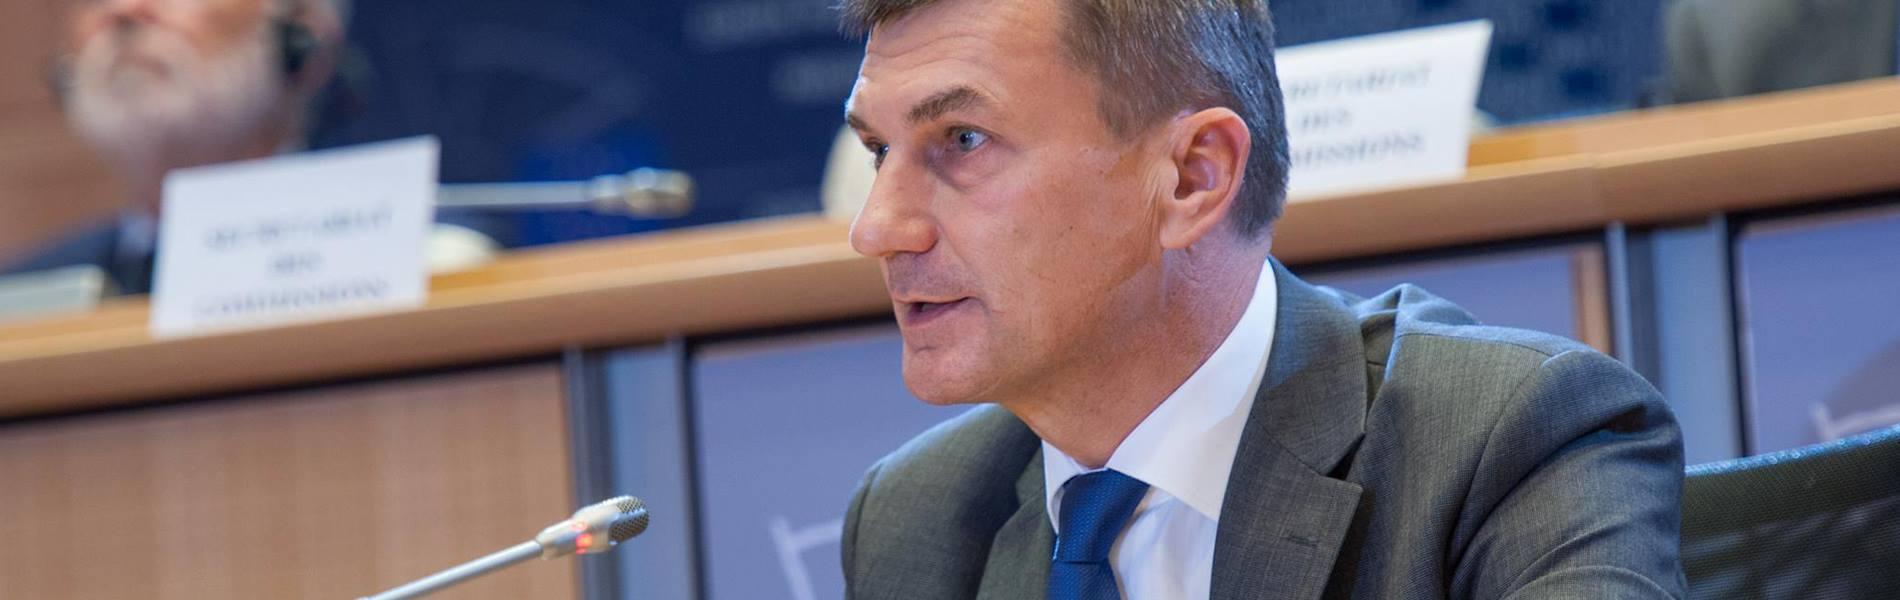 digital single market europe ansip